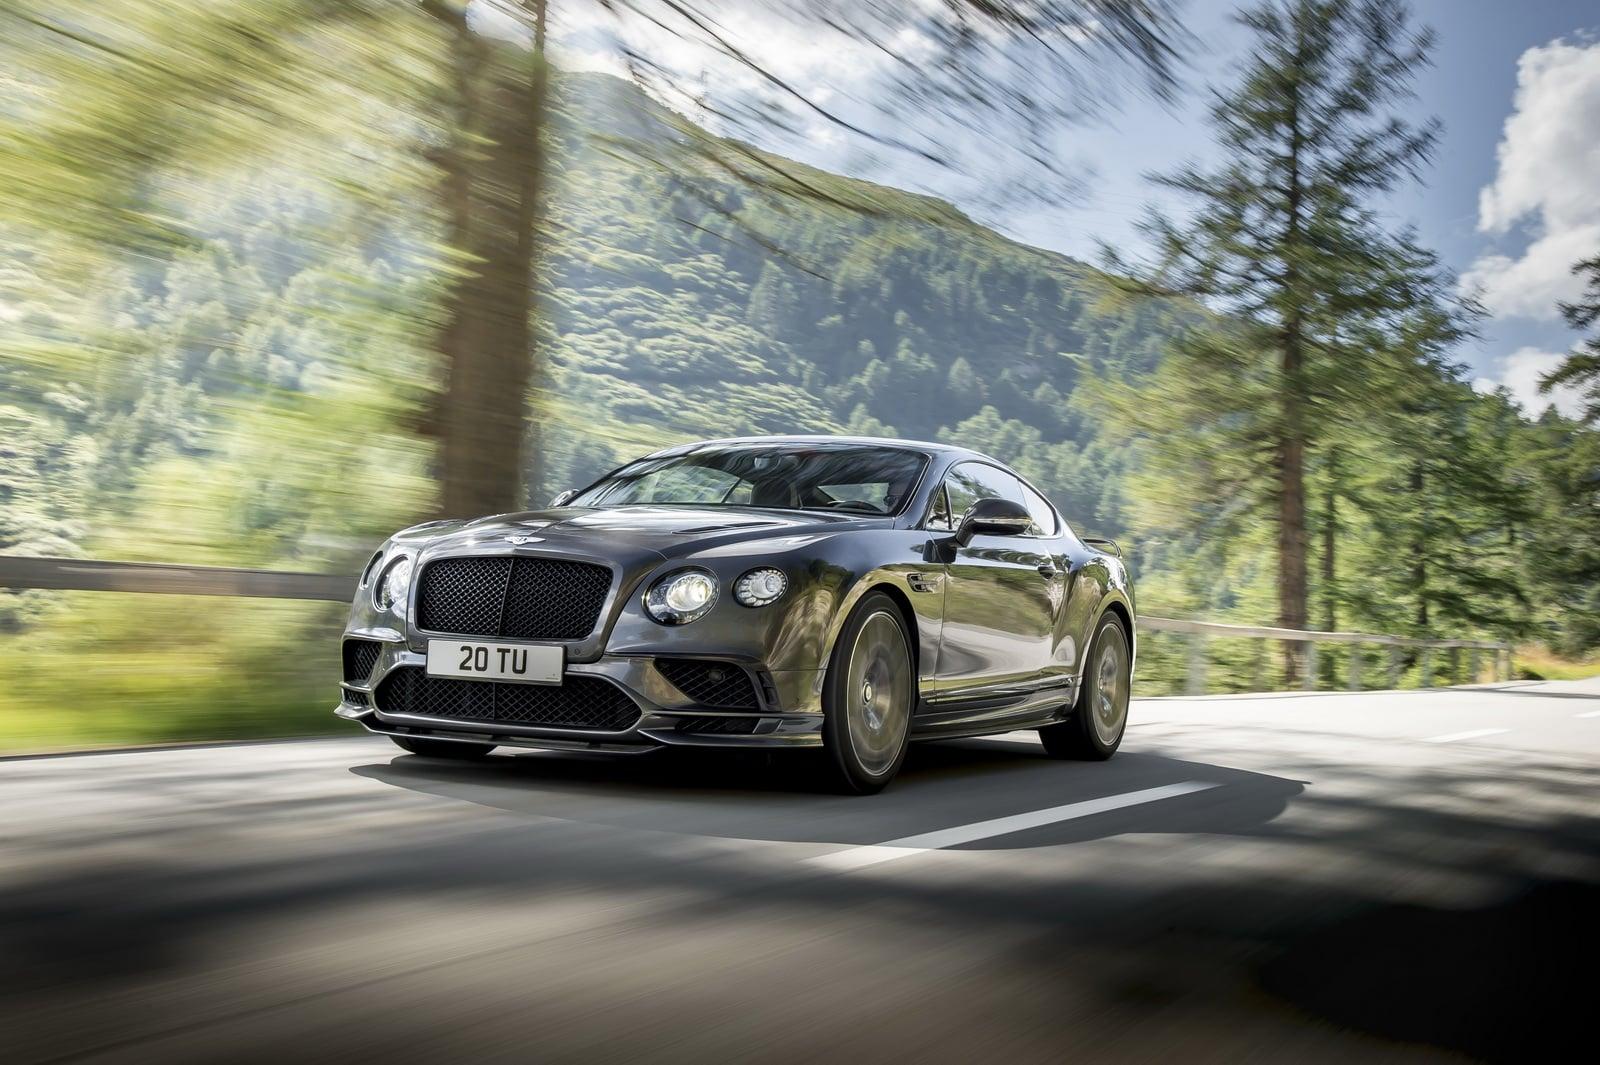 Fotogalerie: Bentley Continental Supersports (2017)